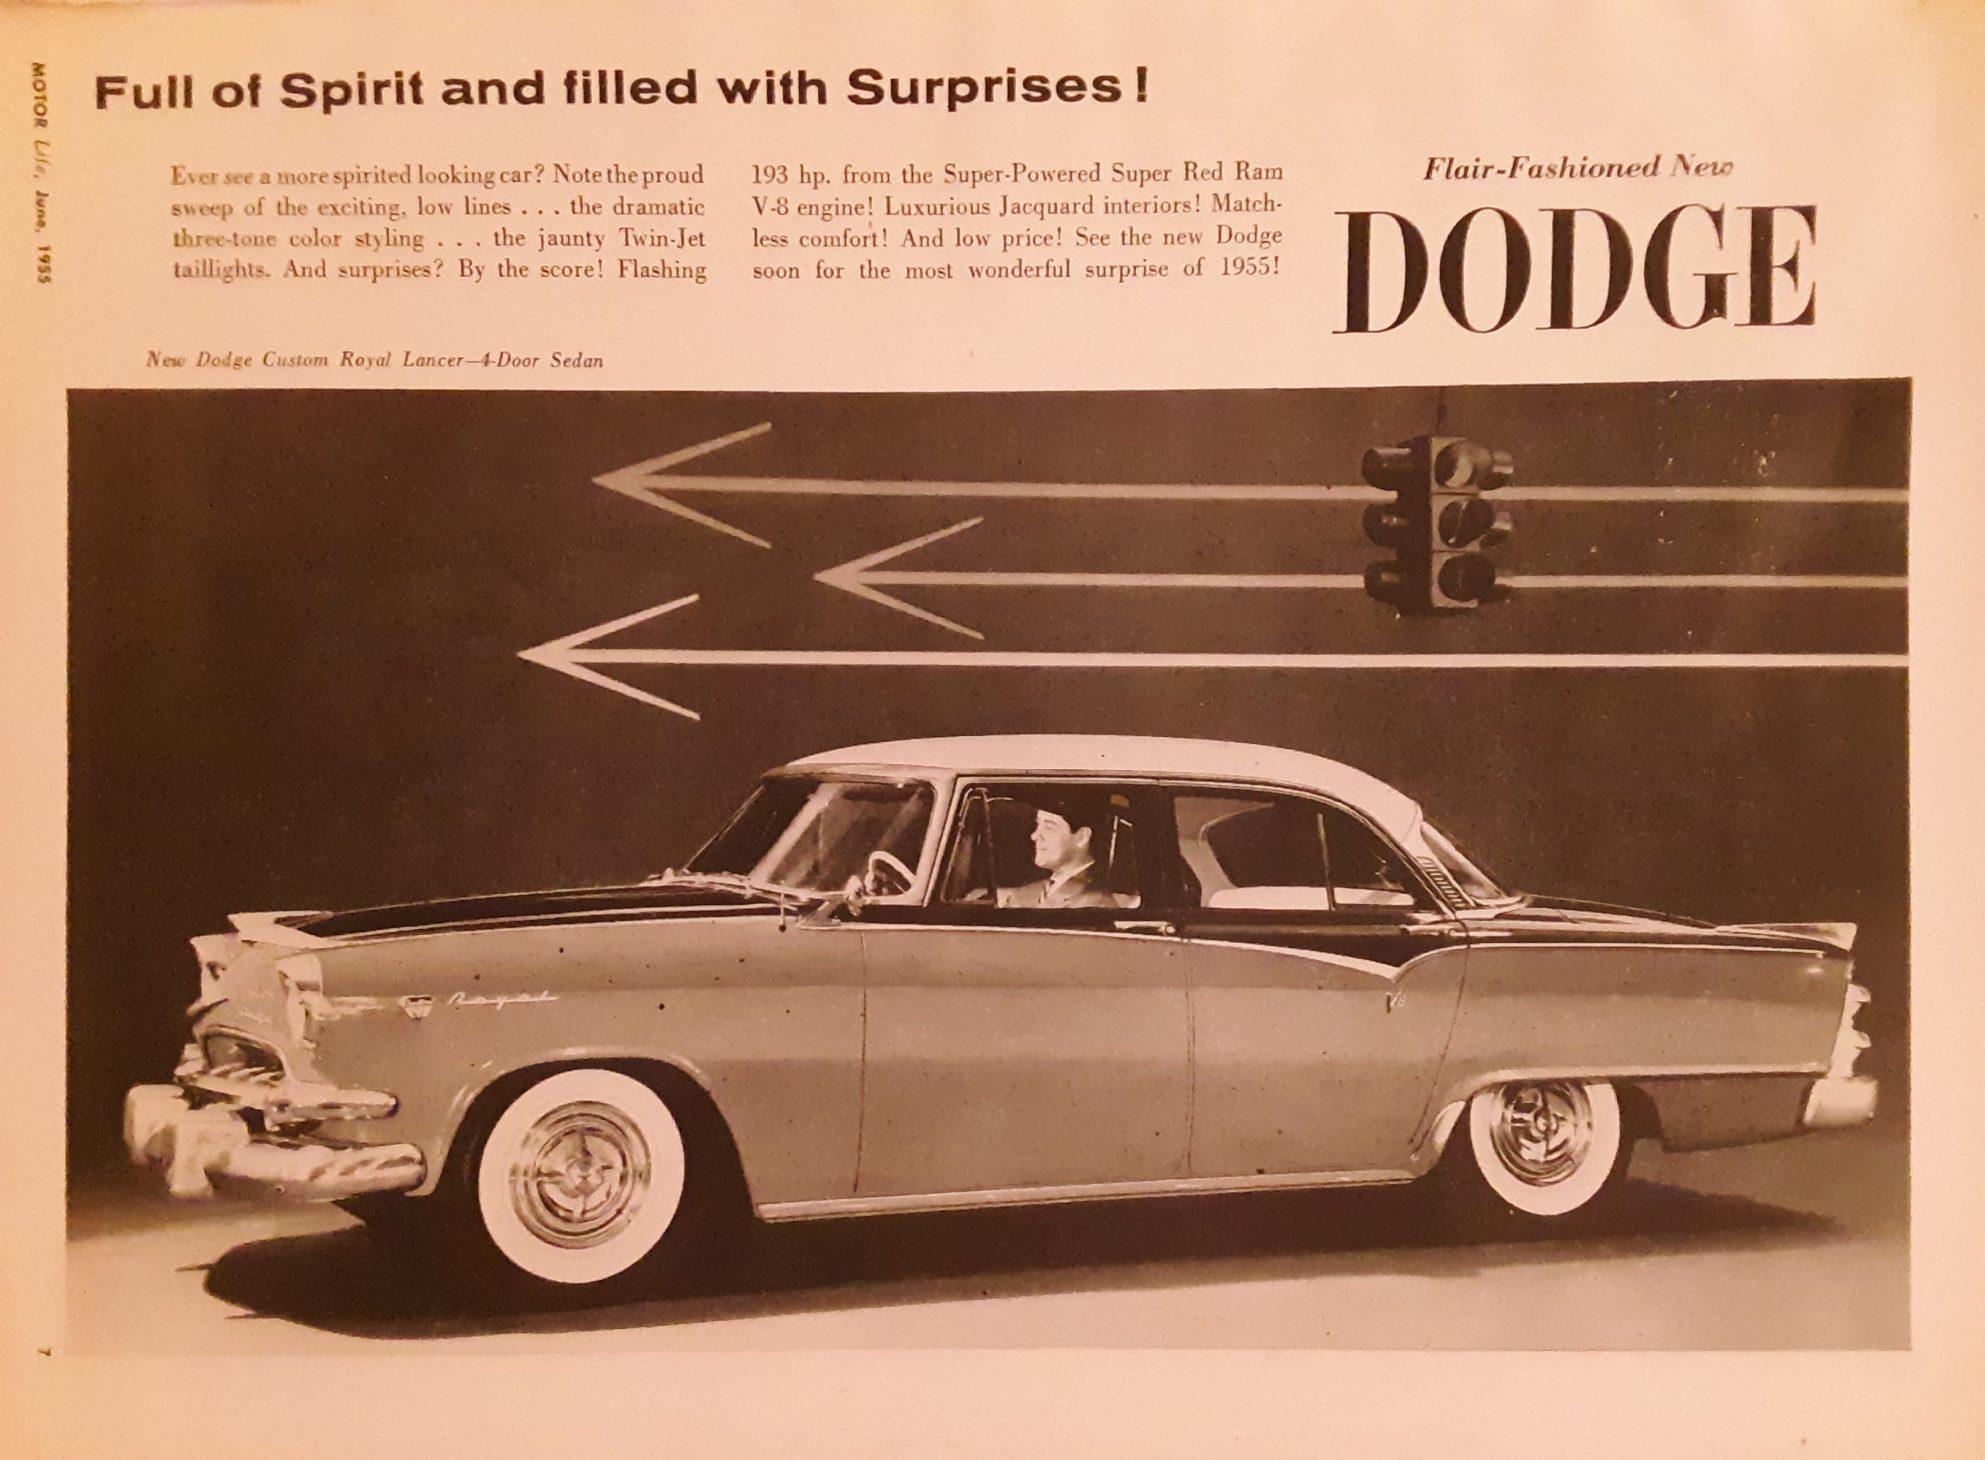 Classic Dodge advertisement for 1955 Custom Dodge Lancer